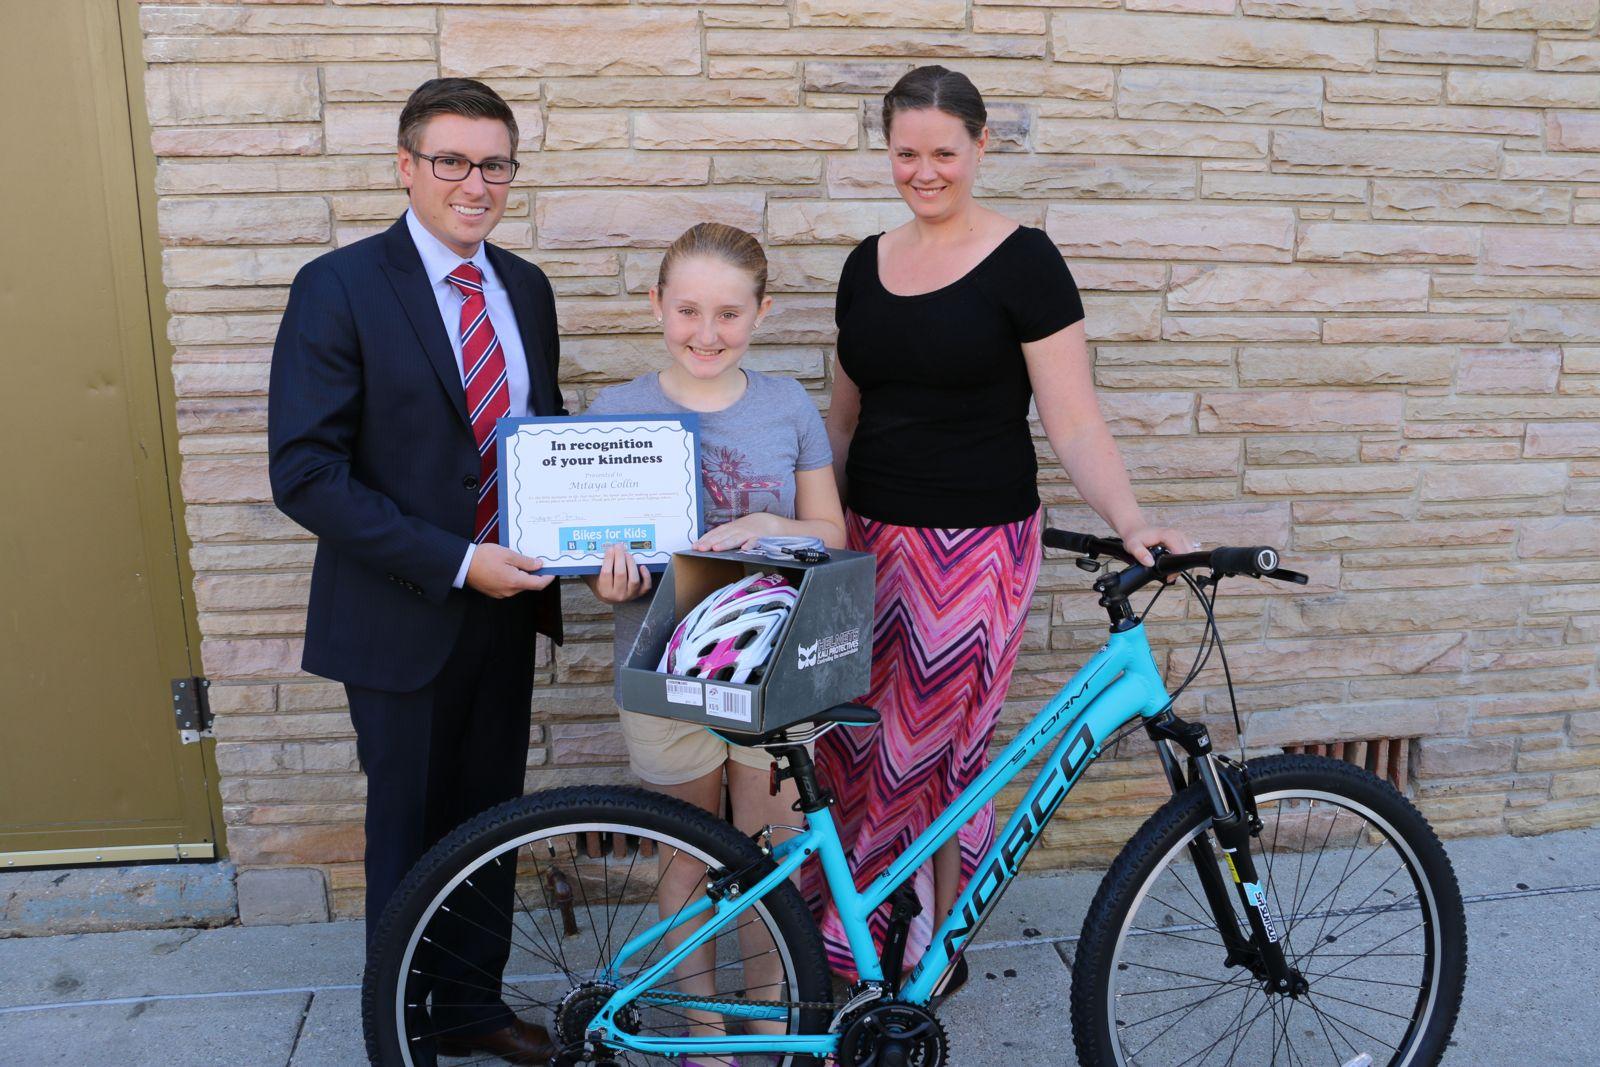 David Barberi, Mitaya Collin, and Allison Quast-Lents - Bikes for Kids 2016